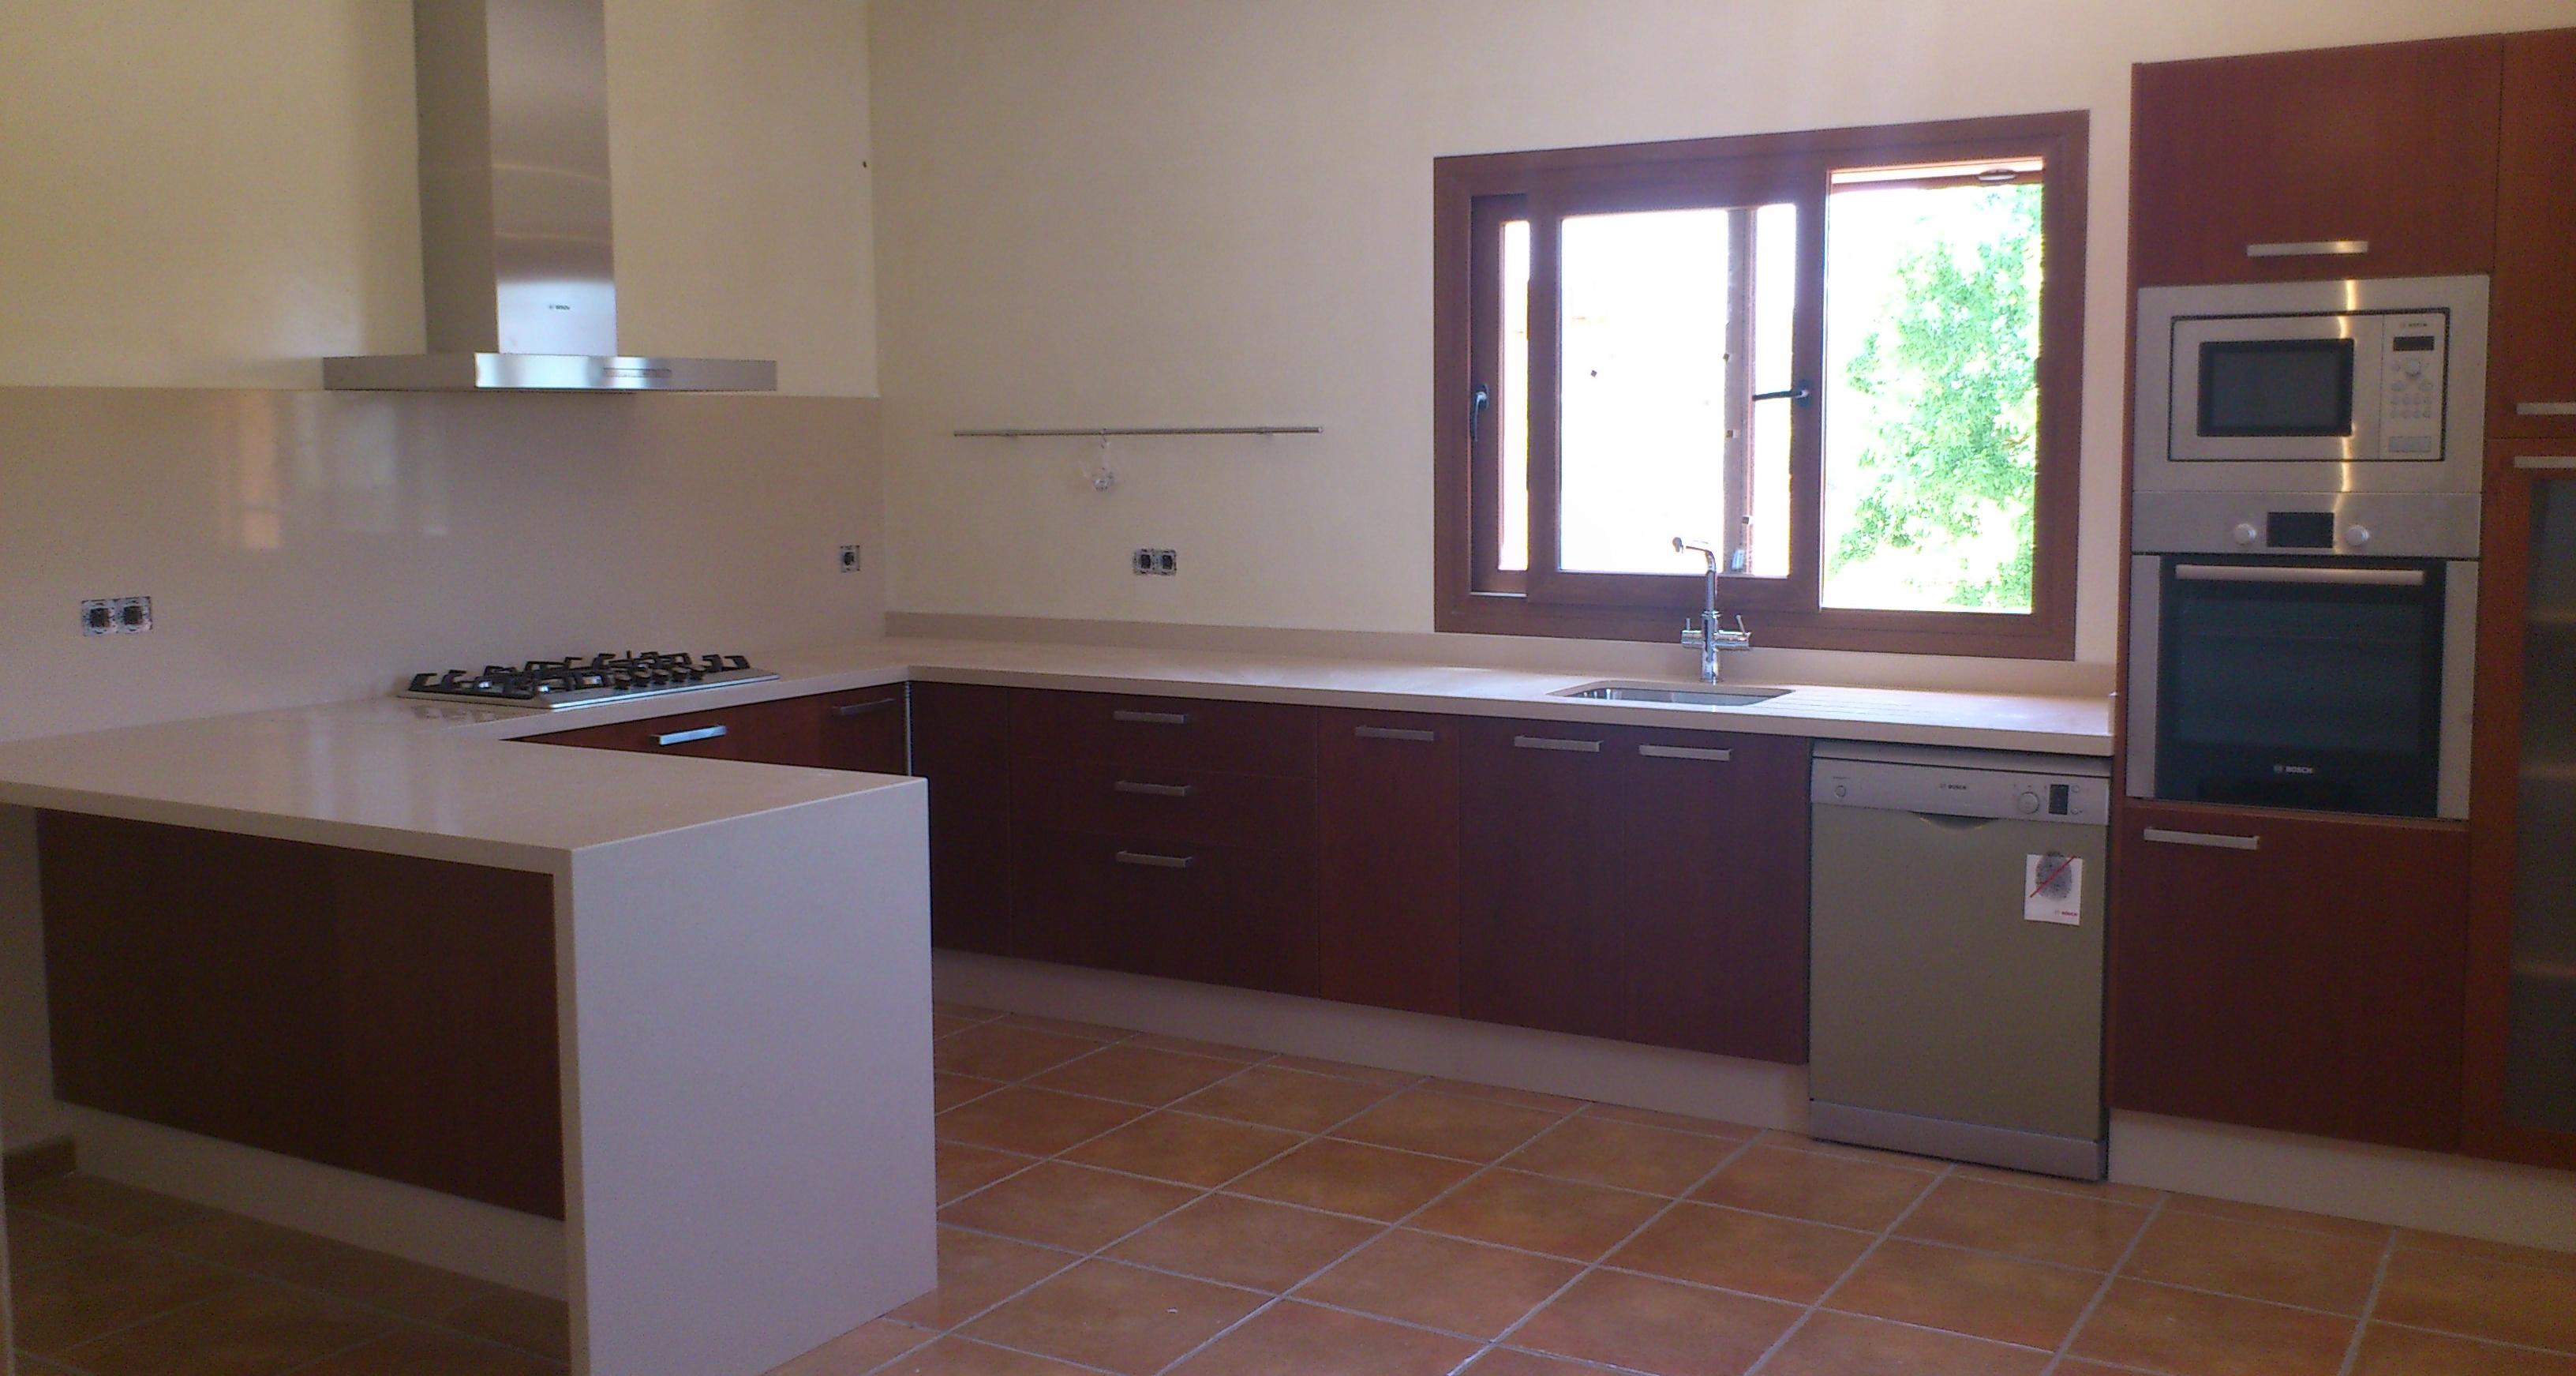 muebles de cocina ibiza – Pàgina 2 – Eivicuines Eva Palerm